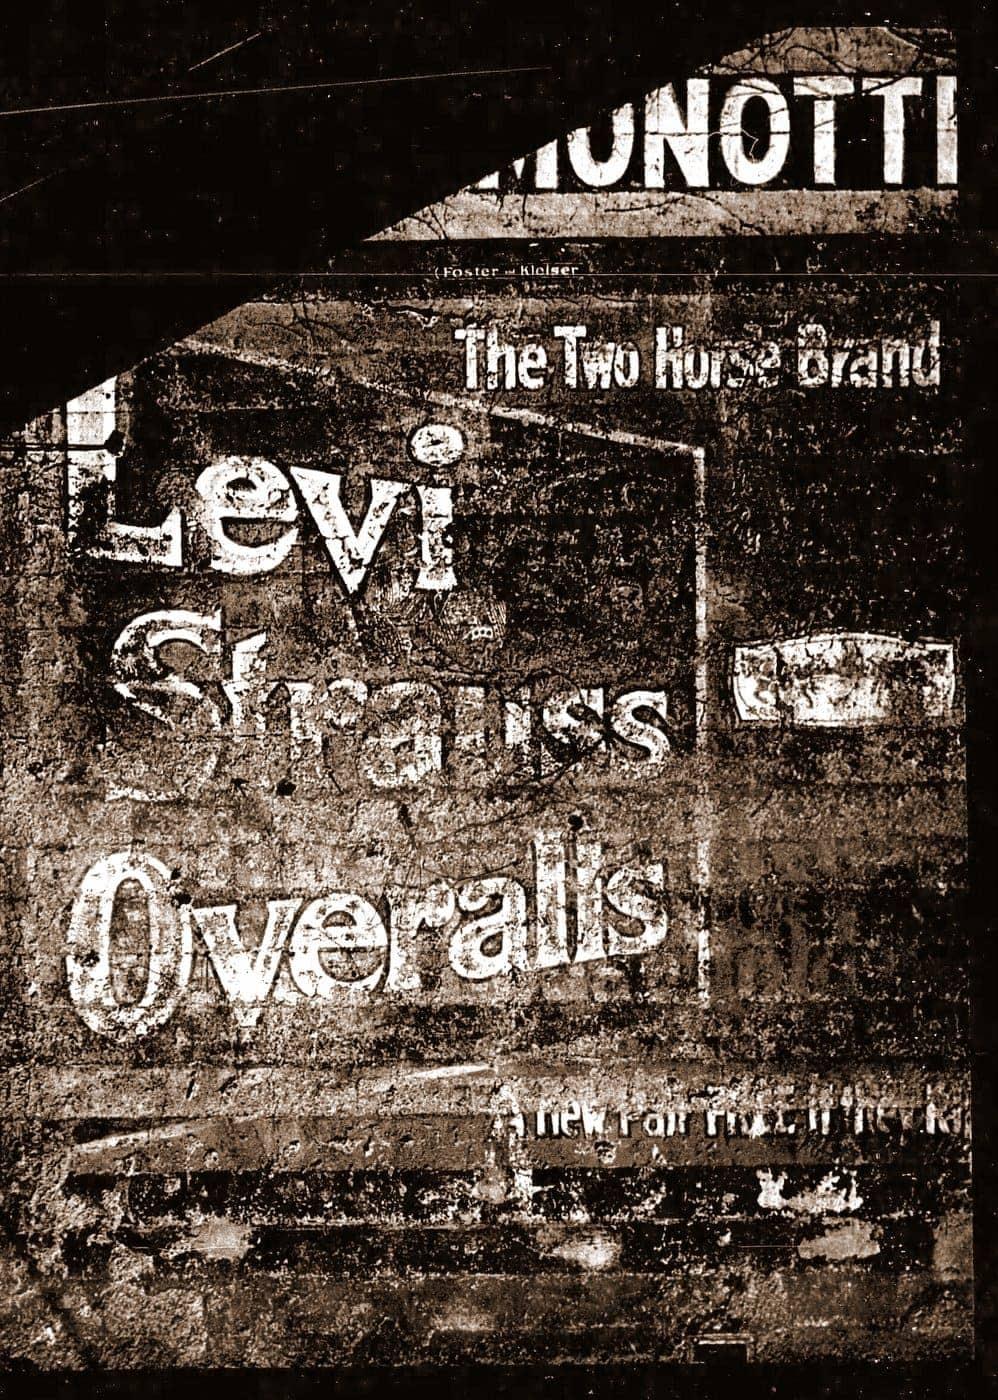 Old Levi's wall ad billboard